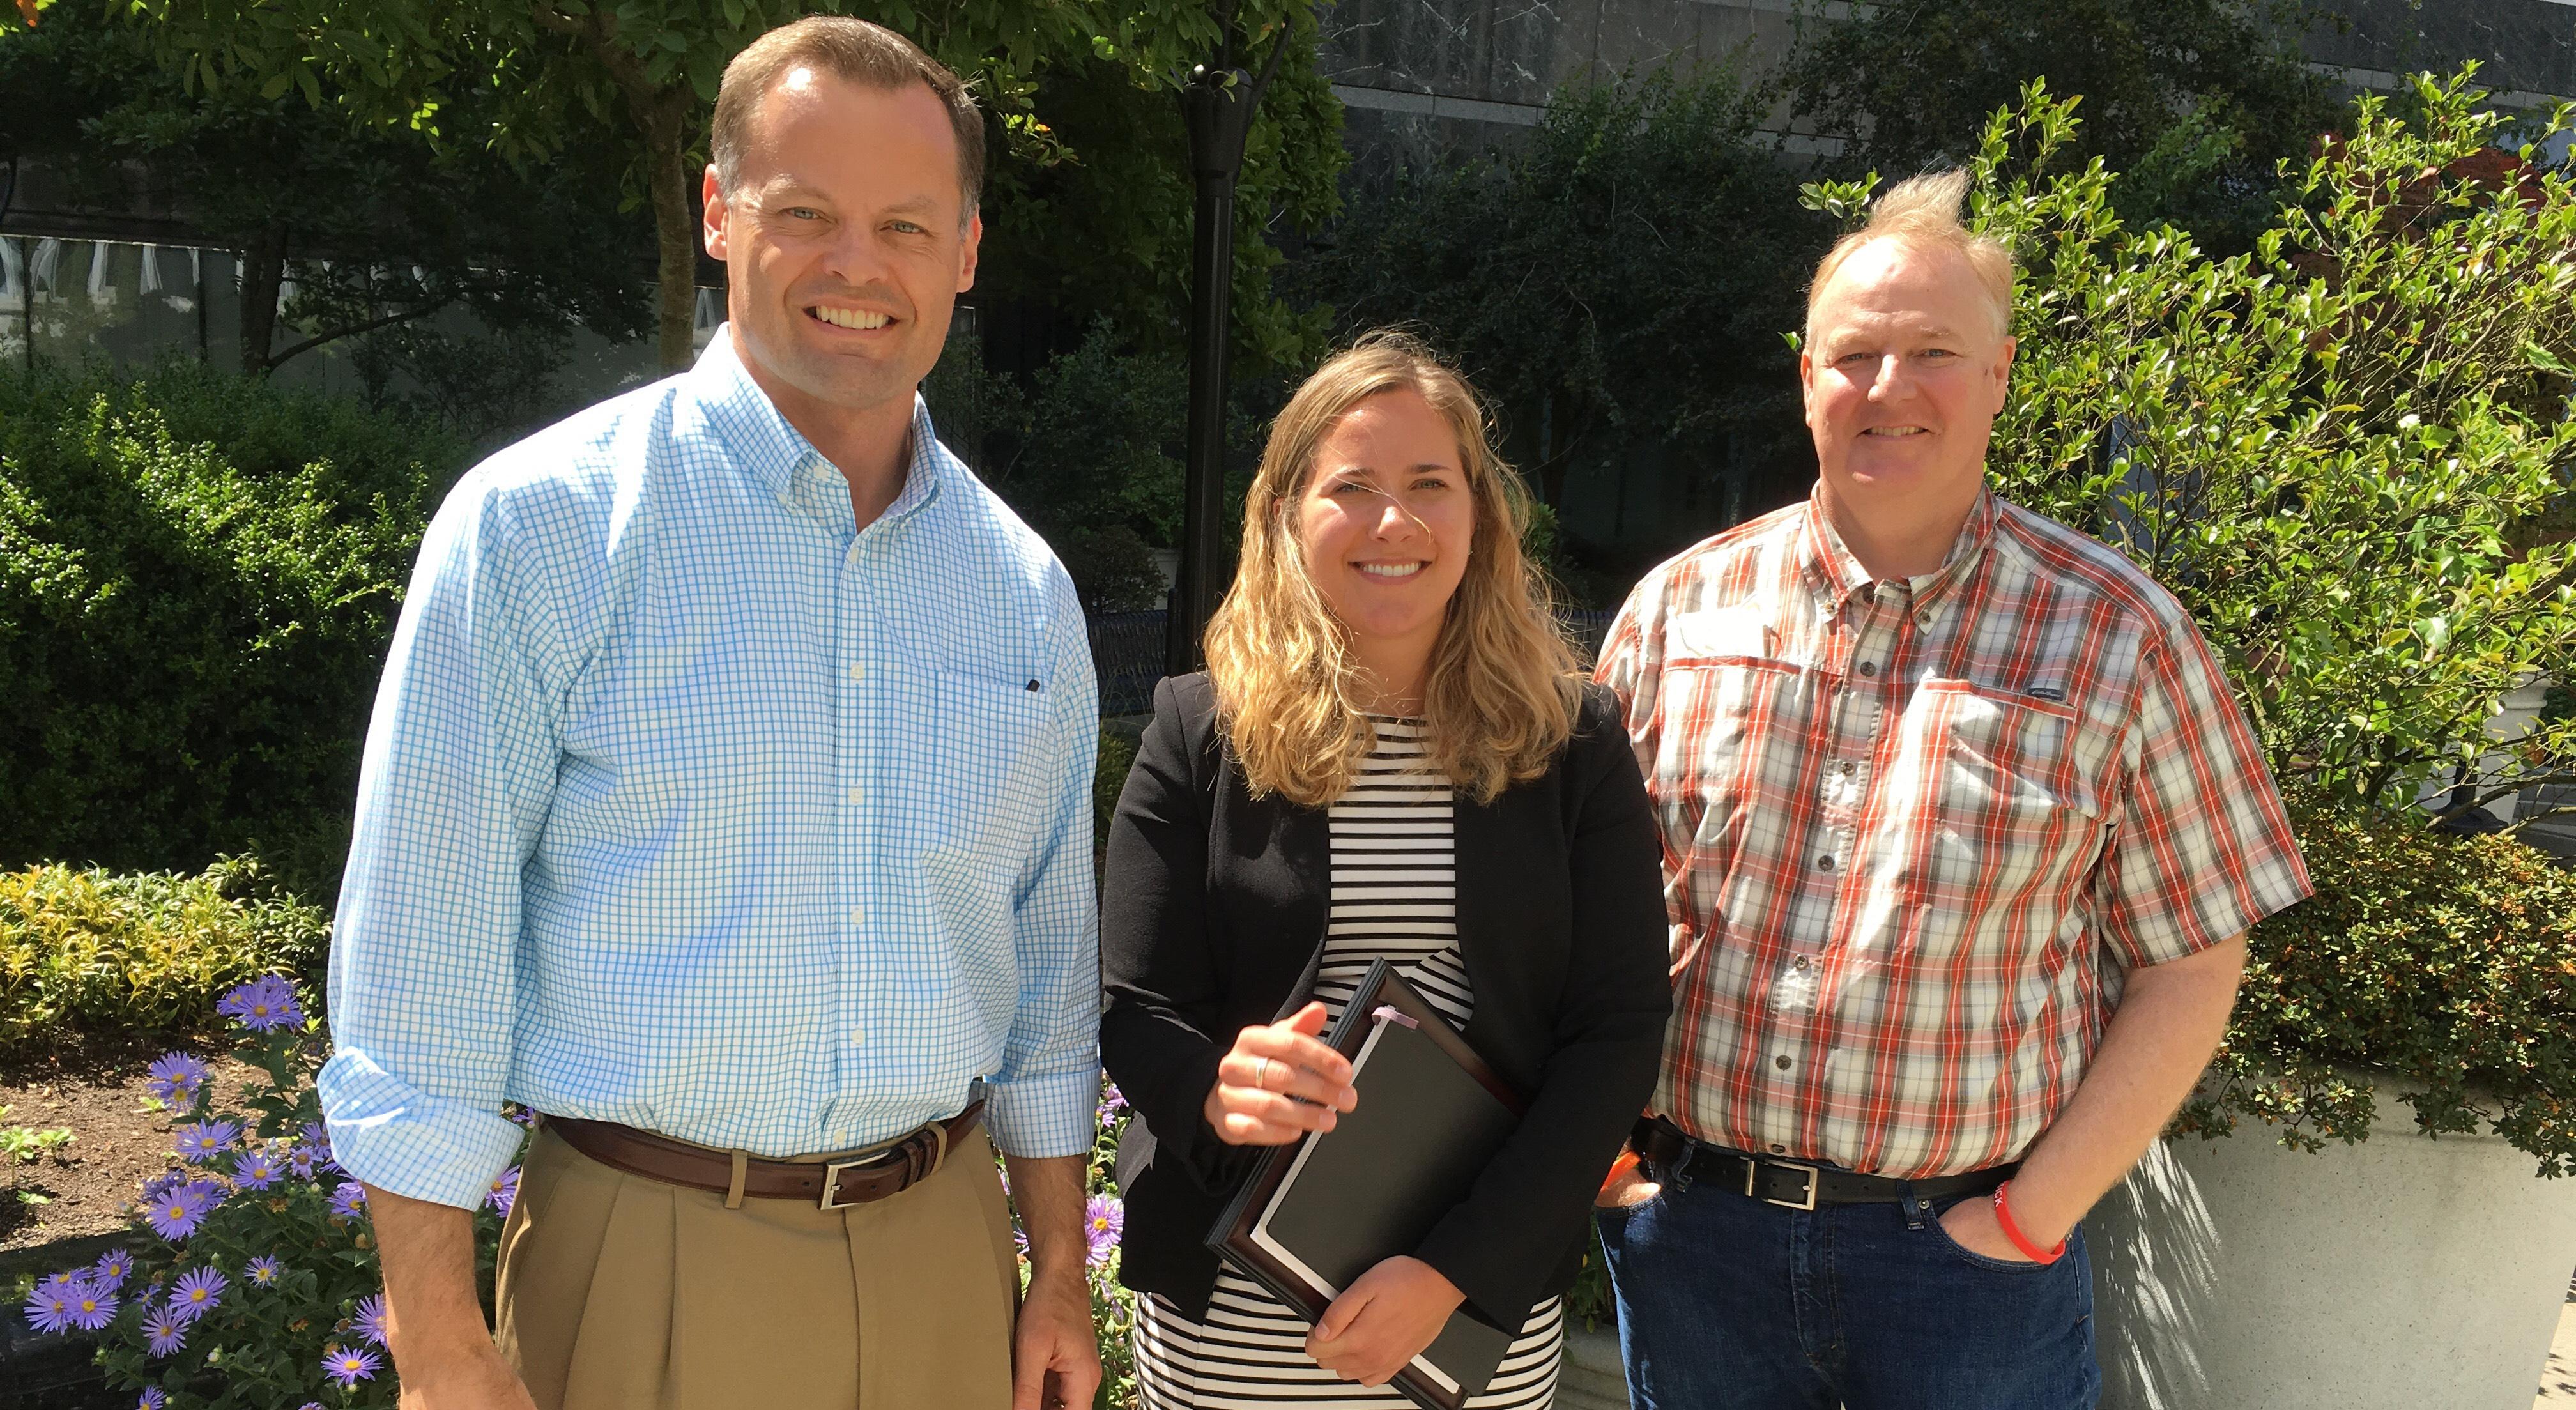 Coalition awards U.S. Rep. Earl Blumenauer Chronic Disease Congressional Champion Award